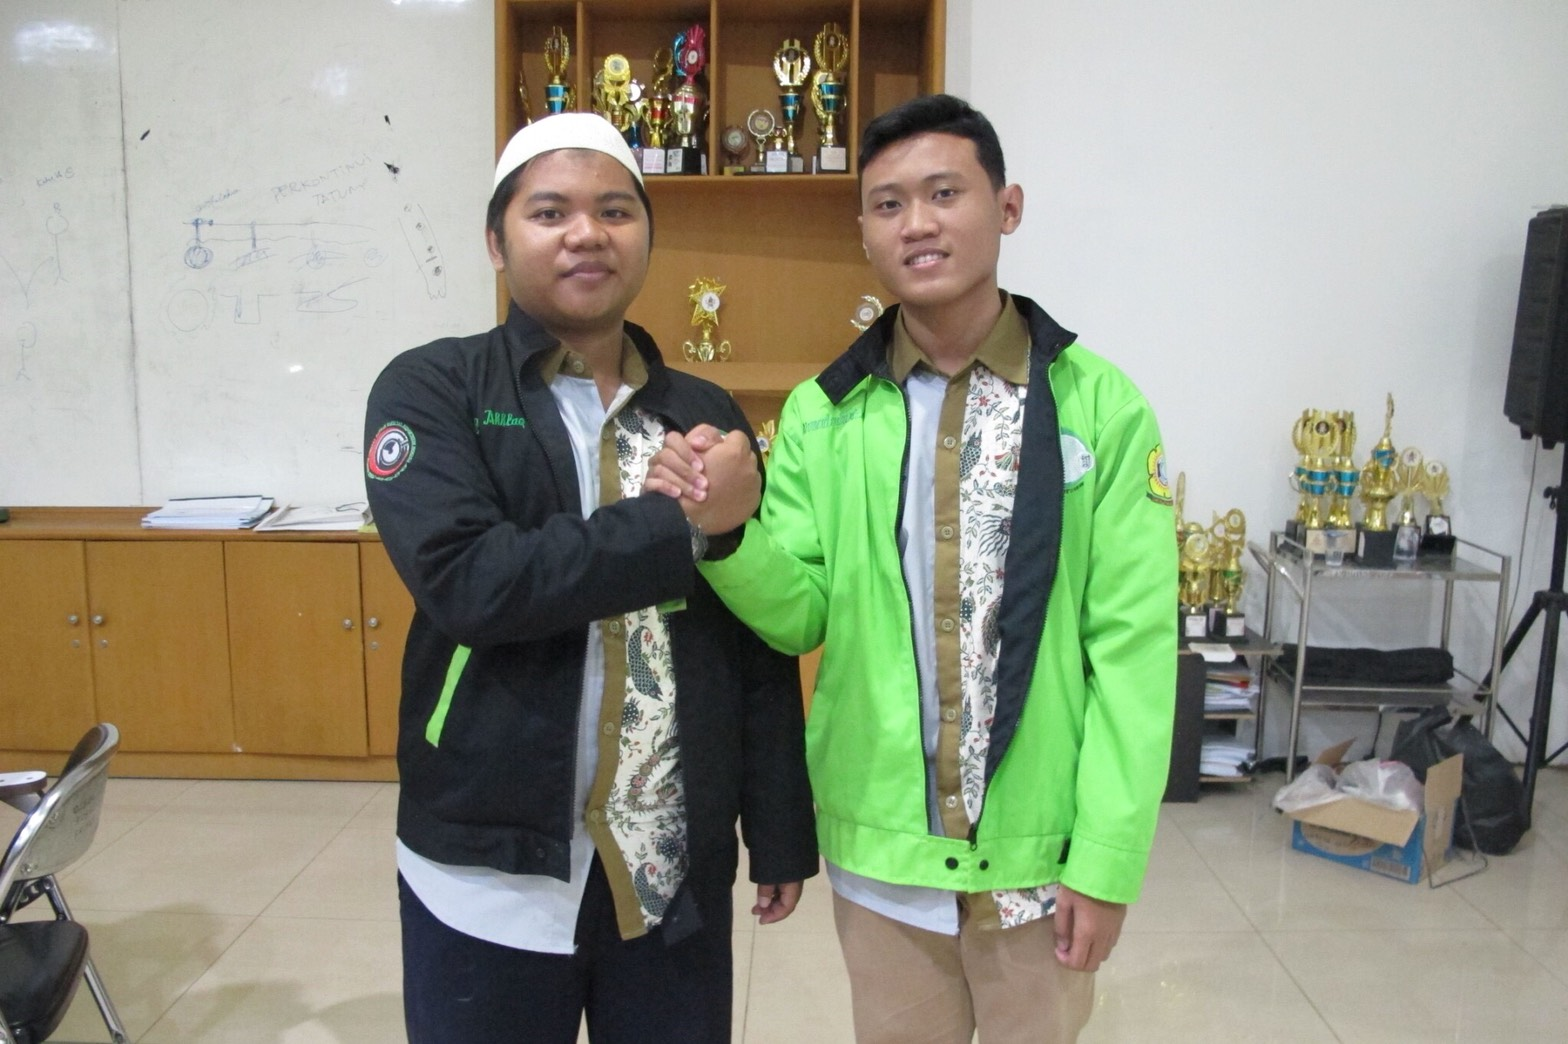 2018 Medifka Ghita Top Putih Iqbal Fadillah Selaku Ketua Umum Bppm As Syifa Periode 2017 Kiri Dengan Asy Yang Baru Terpilih 2019 Ahmad Kasyfi